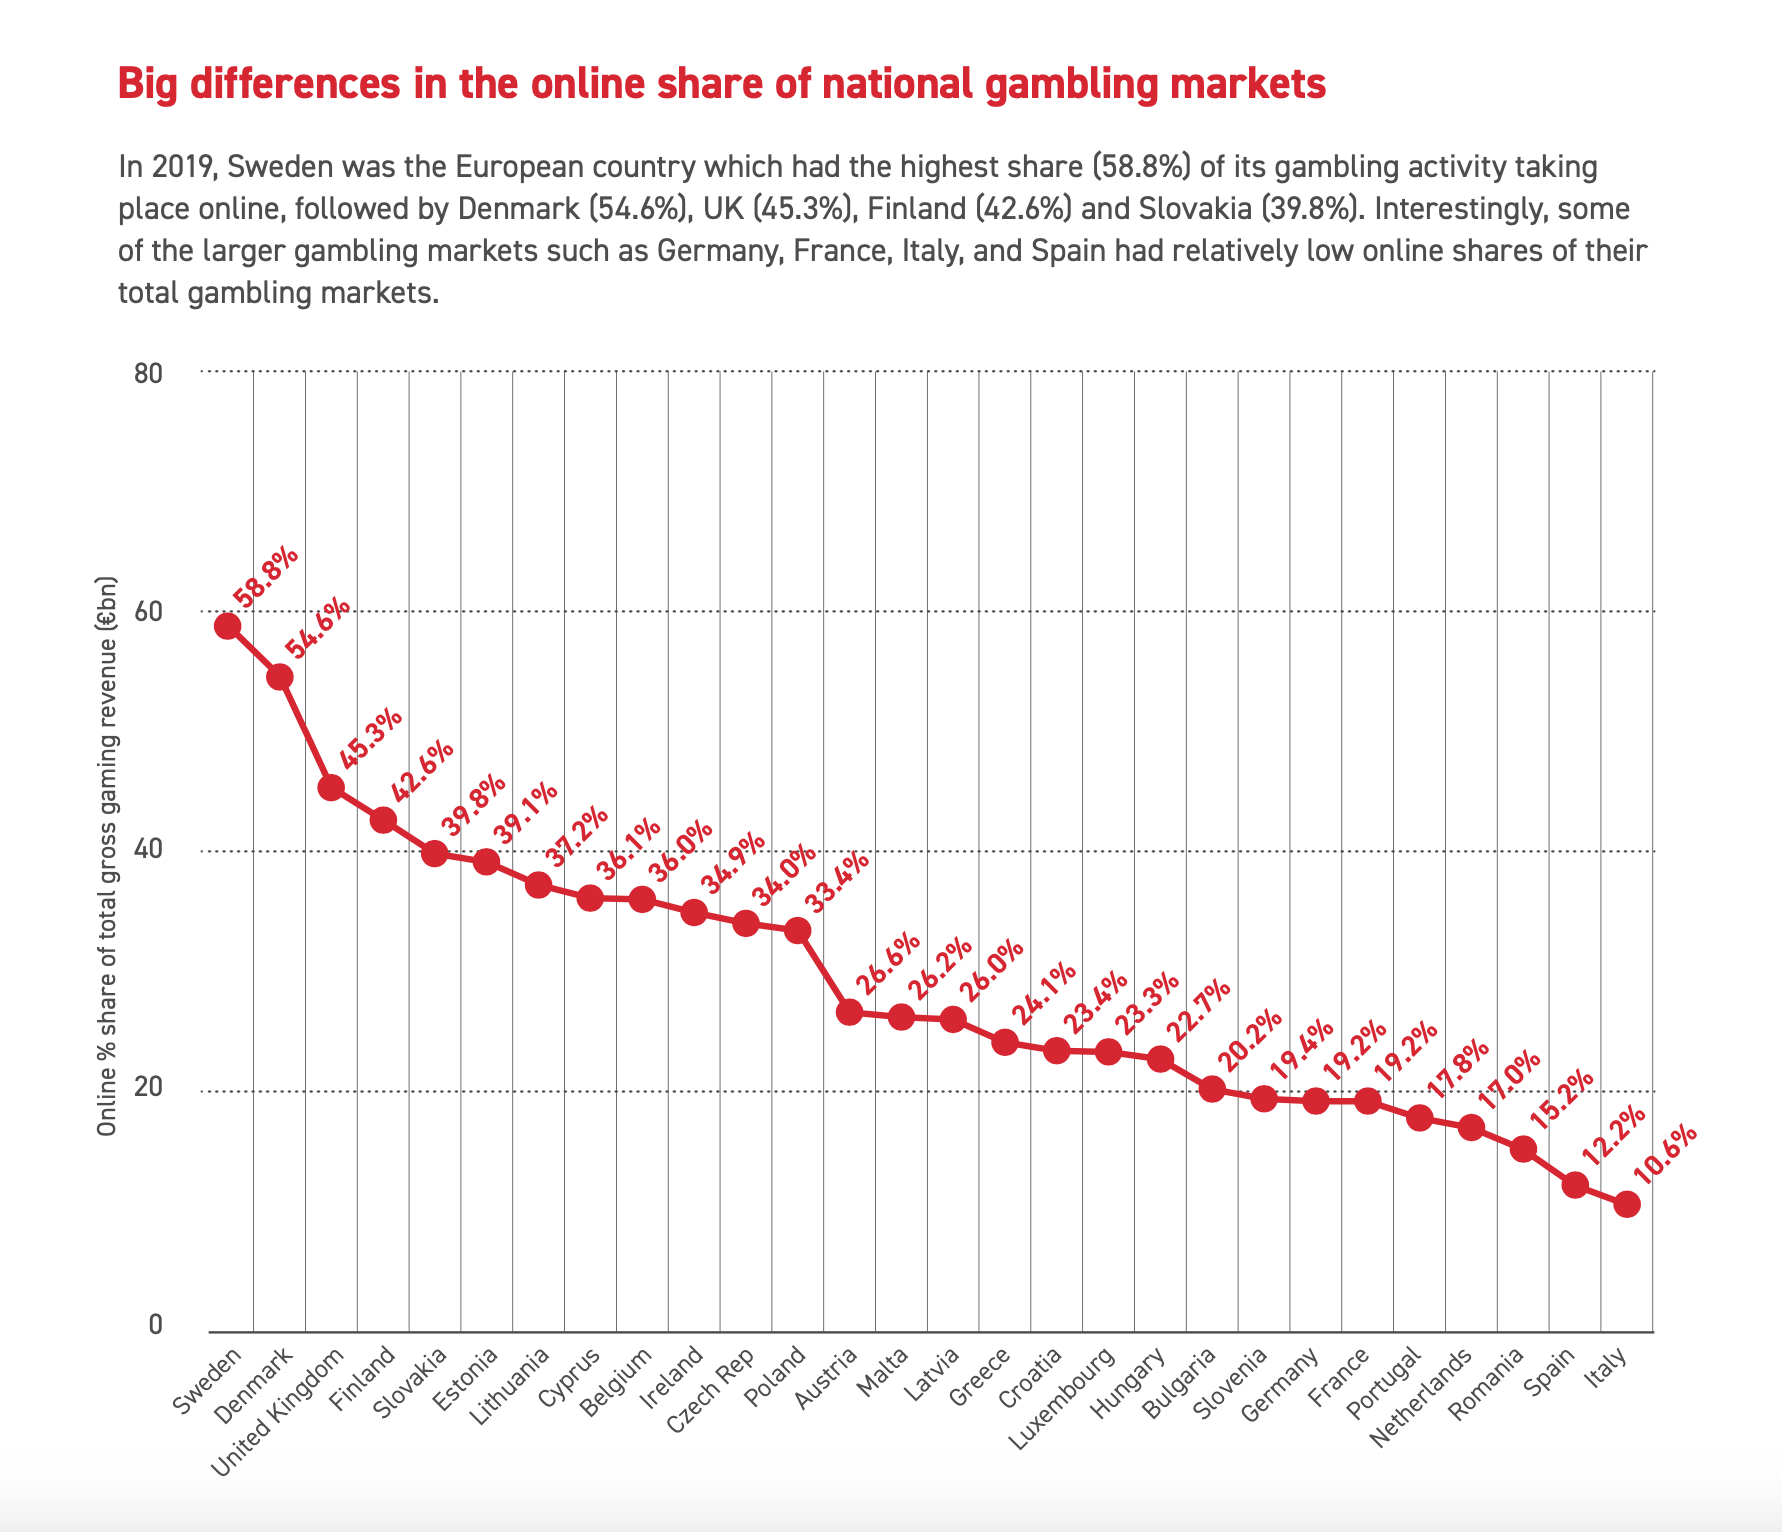 National online gambling shares in the European gambling market